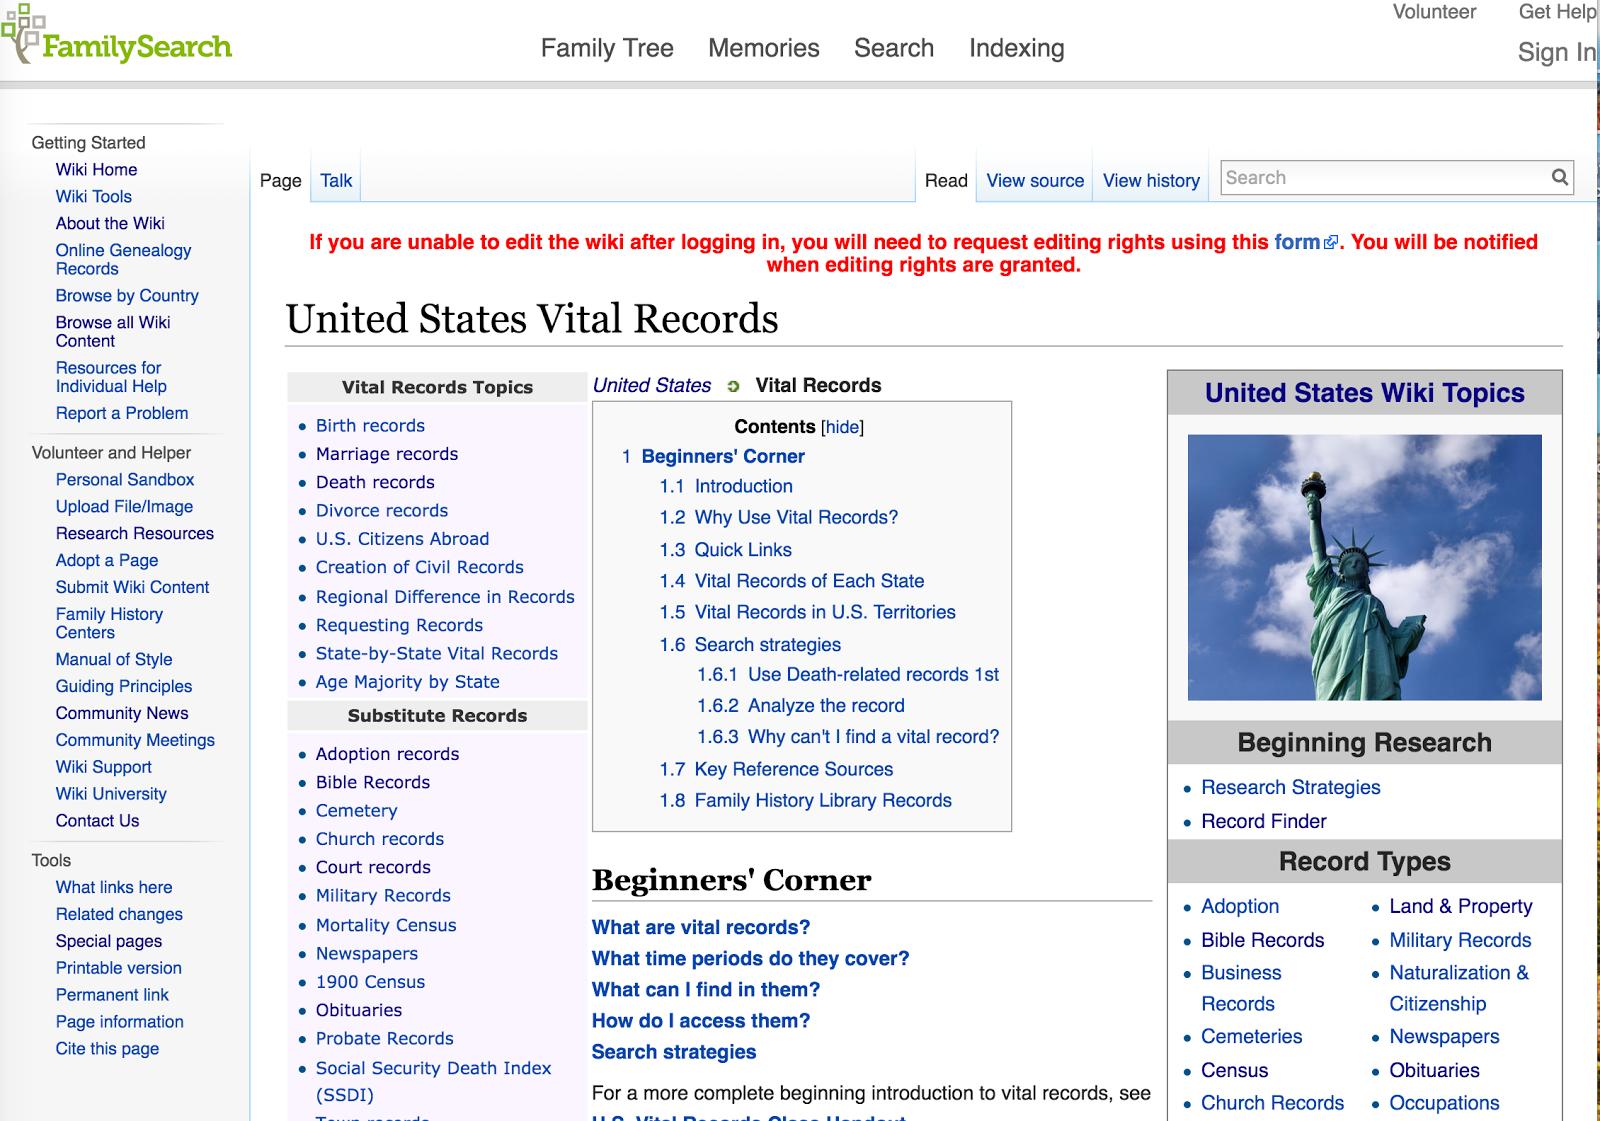 California Vital Records Genealogy - FamilySearch Wiki